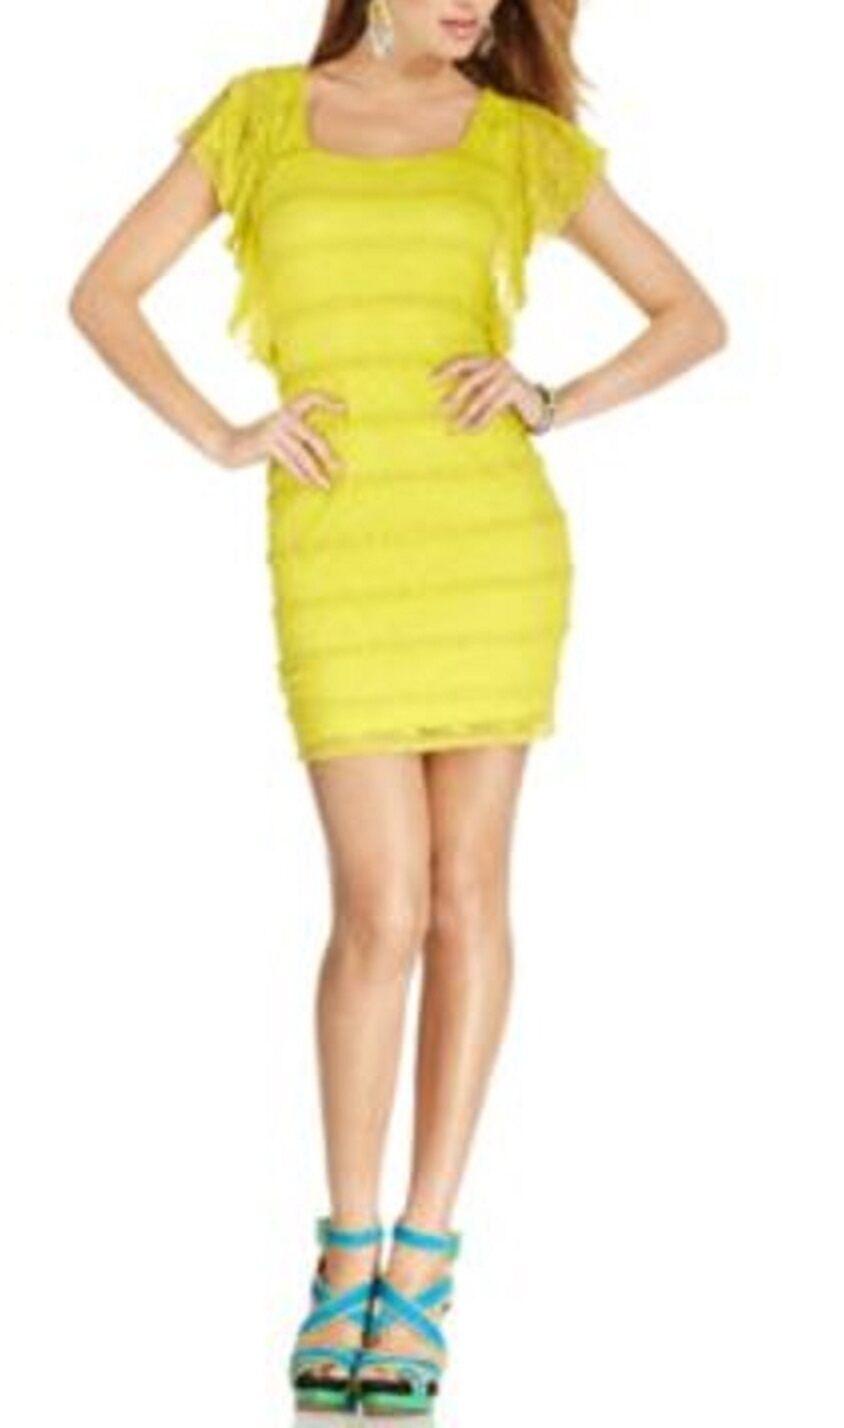 Guess Los Angeles Dress Sz 2 Lime Grün Jessica Lace Tierot Cocktail Party Dress